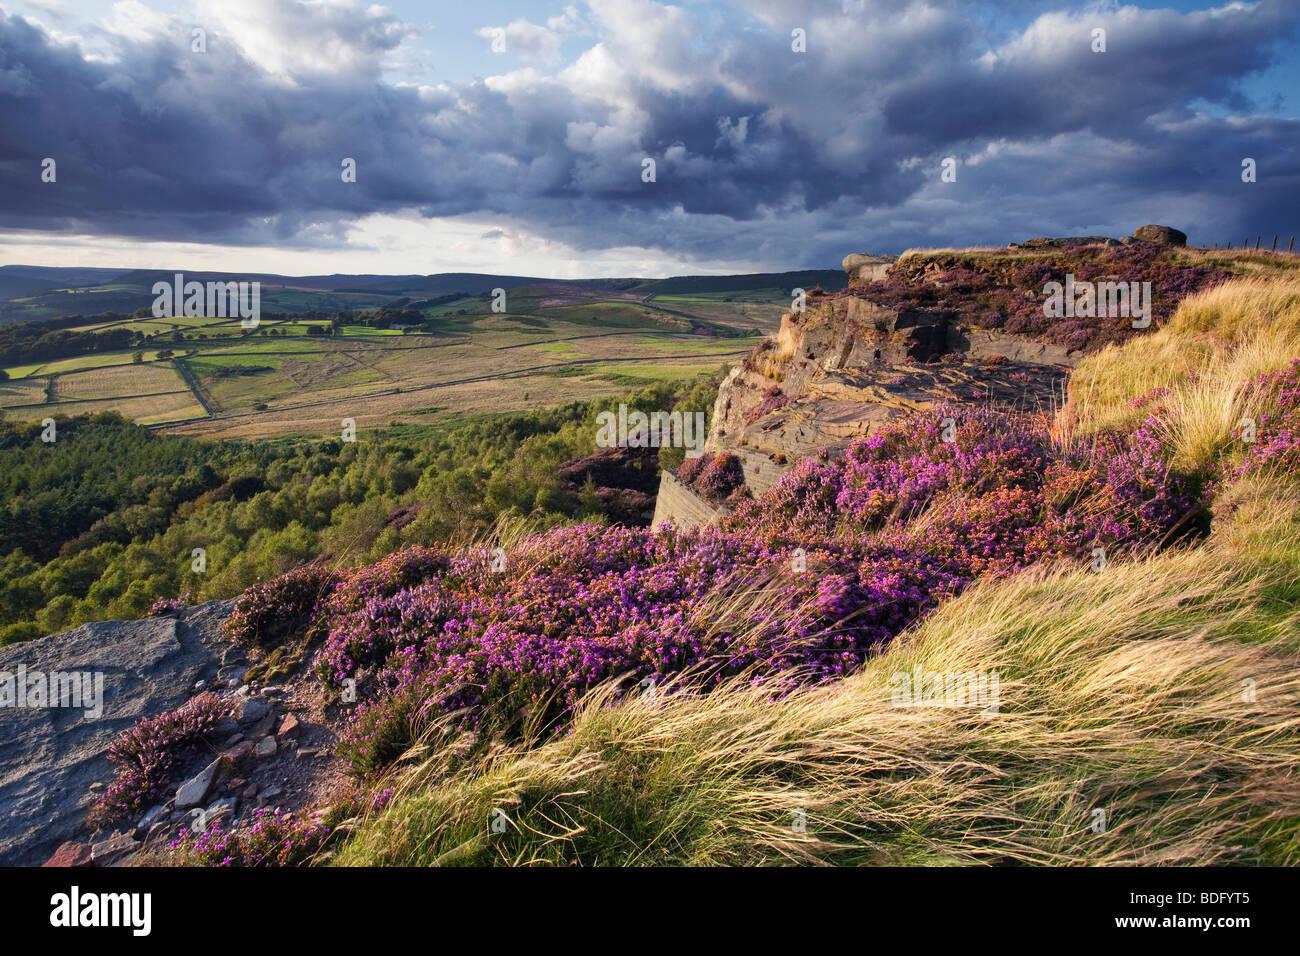 Millstone Edge on Hathersage Moor, near the village of Hathersage in the Peak District National Park, Derbyshire, - Stock Image